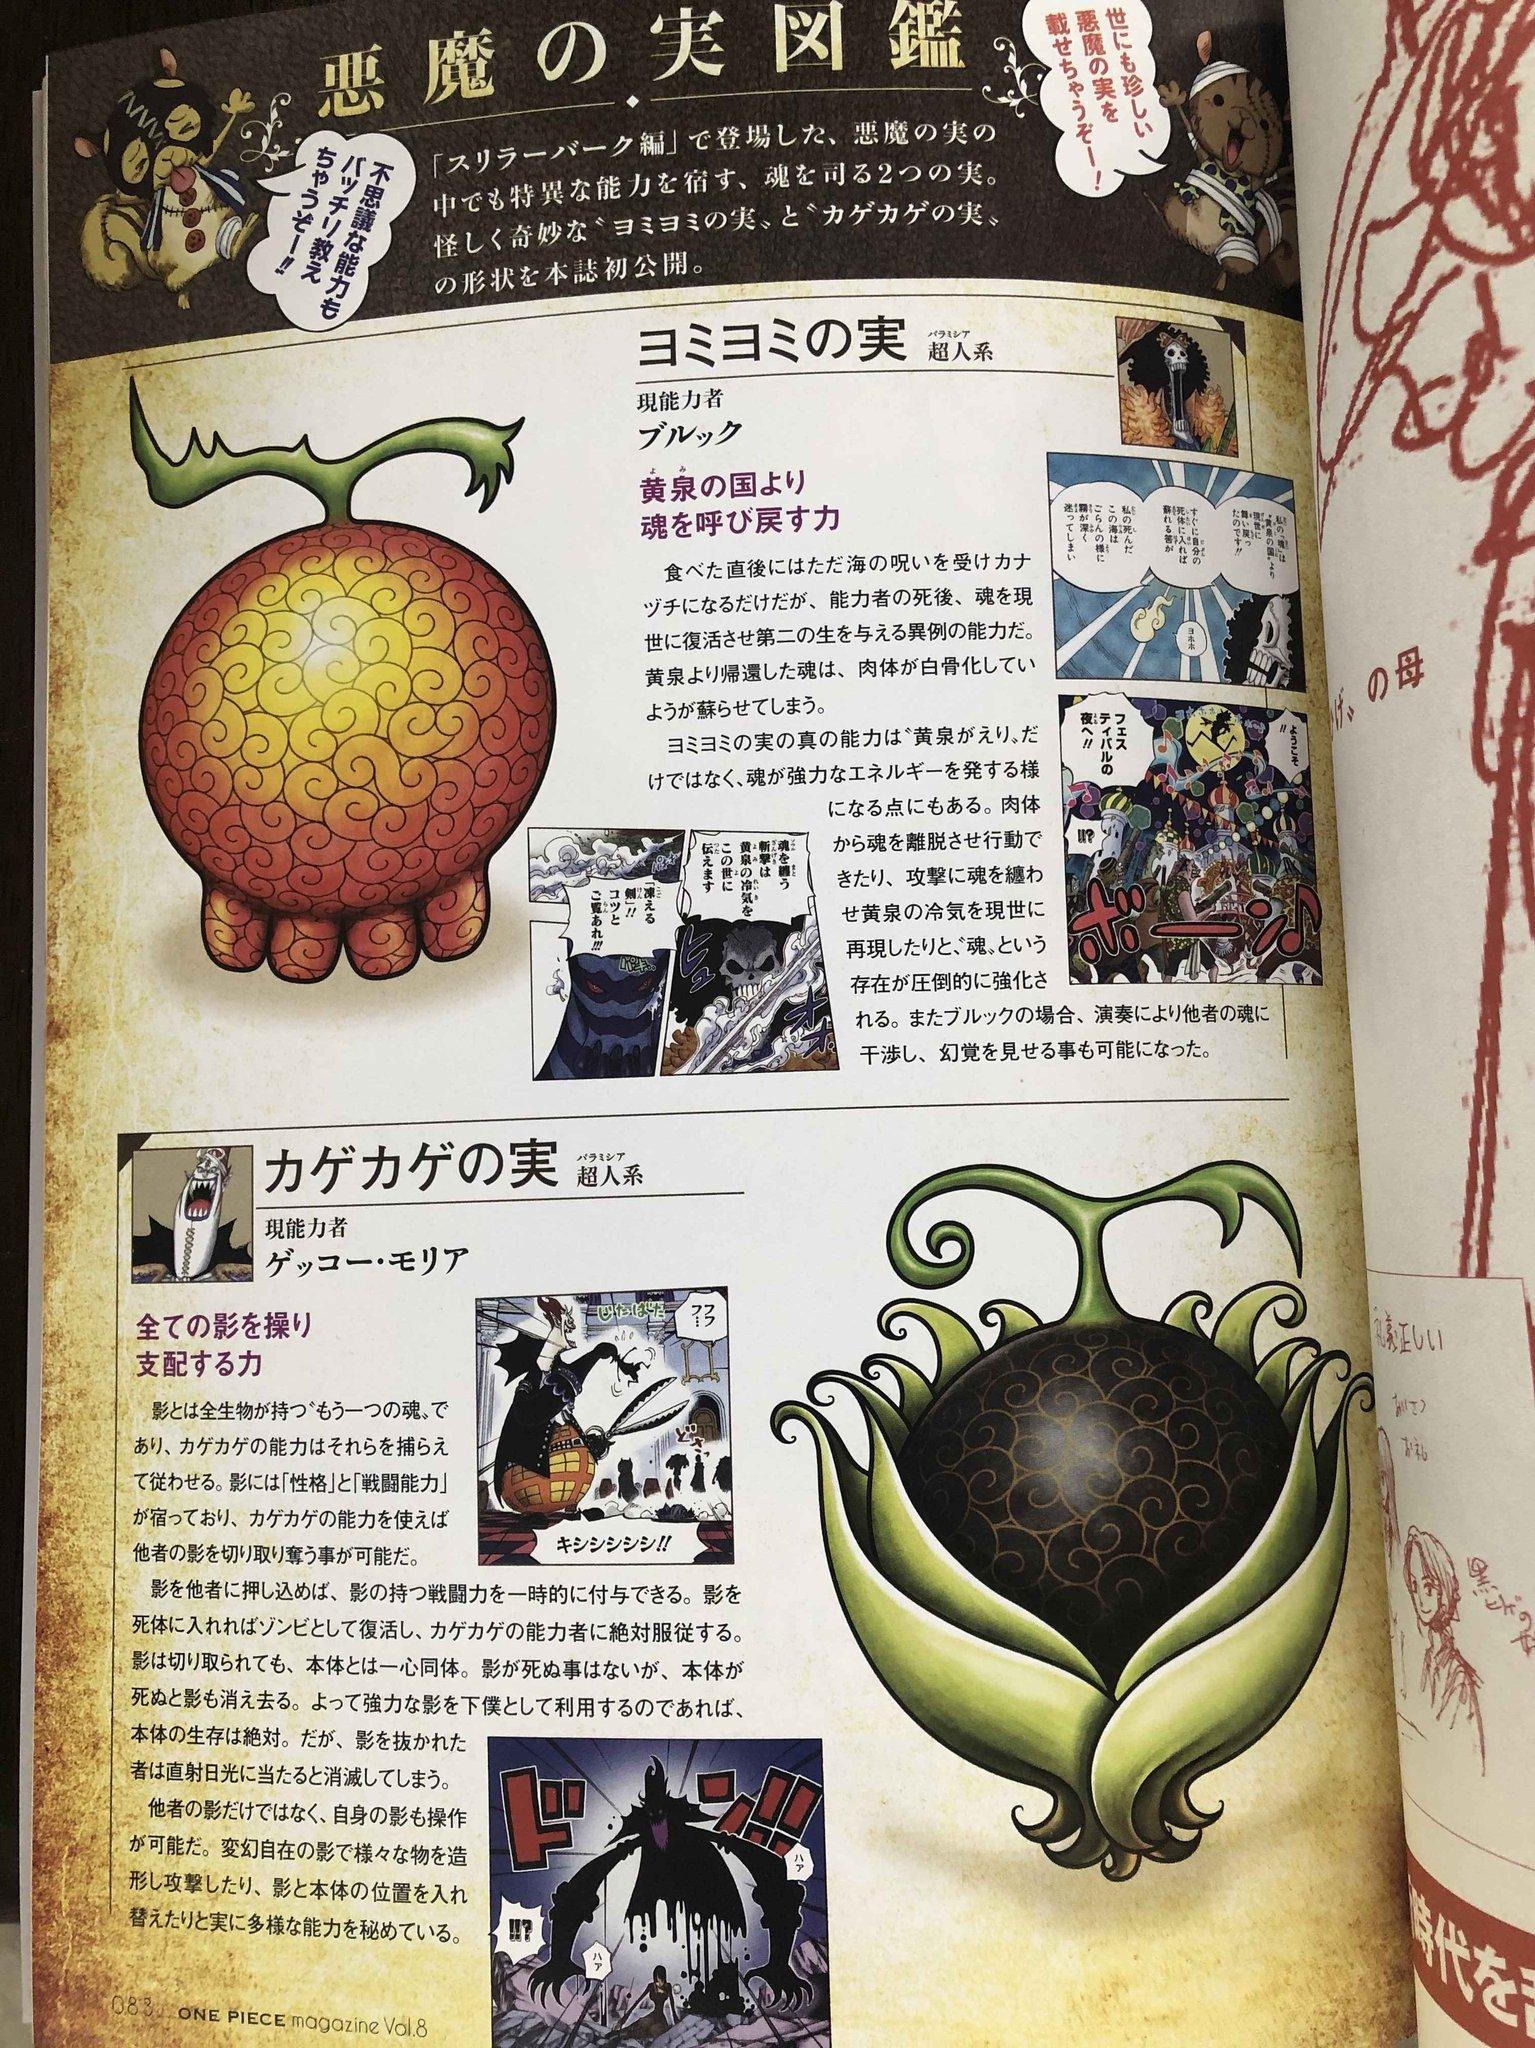 One Piece Chapter Summaries